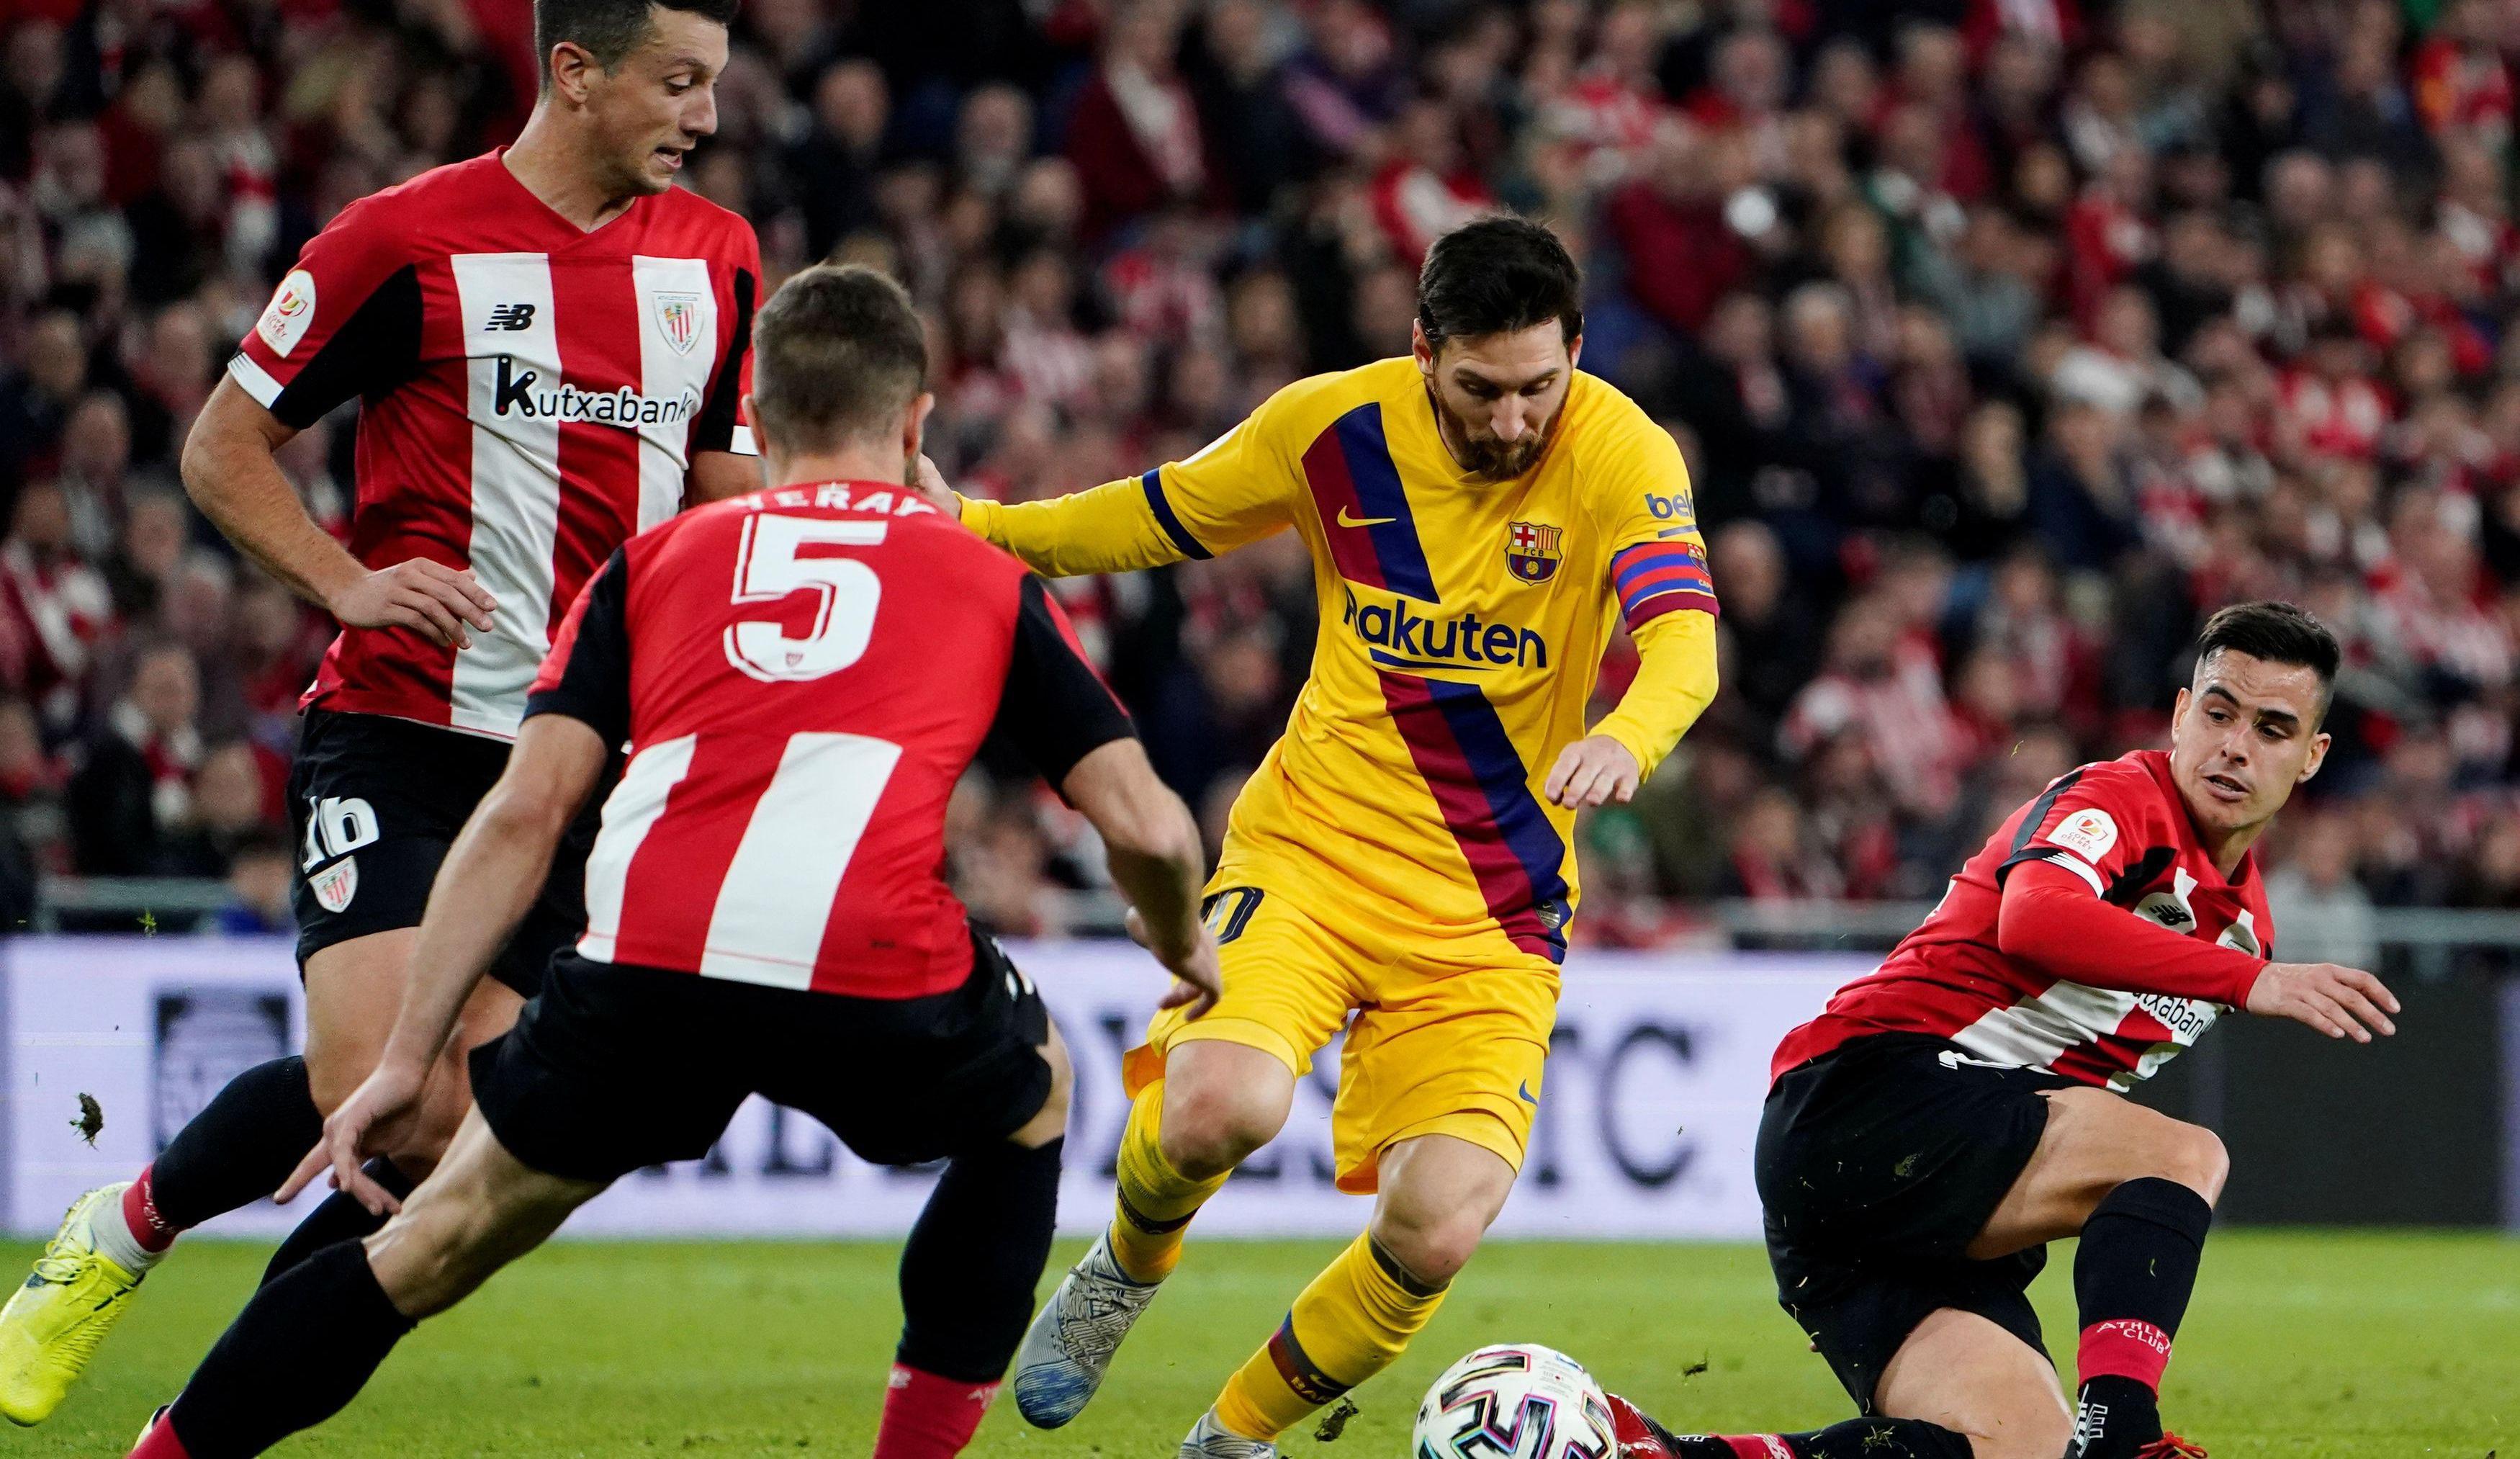 (ÖZET) Athletic Bilbao, Barcelona'yı 90+3te vurdu!